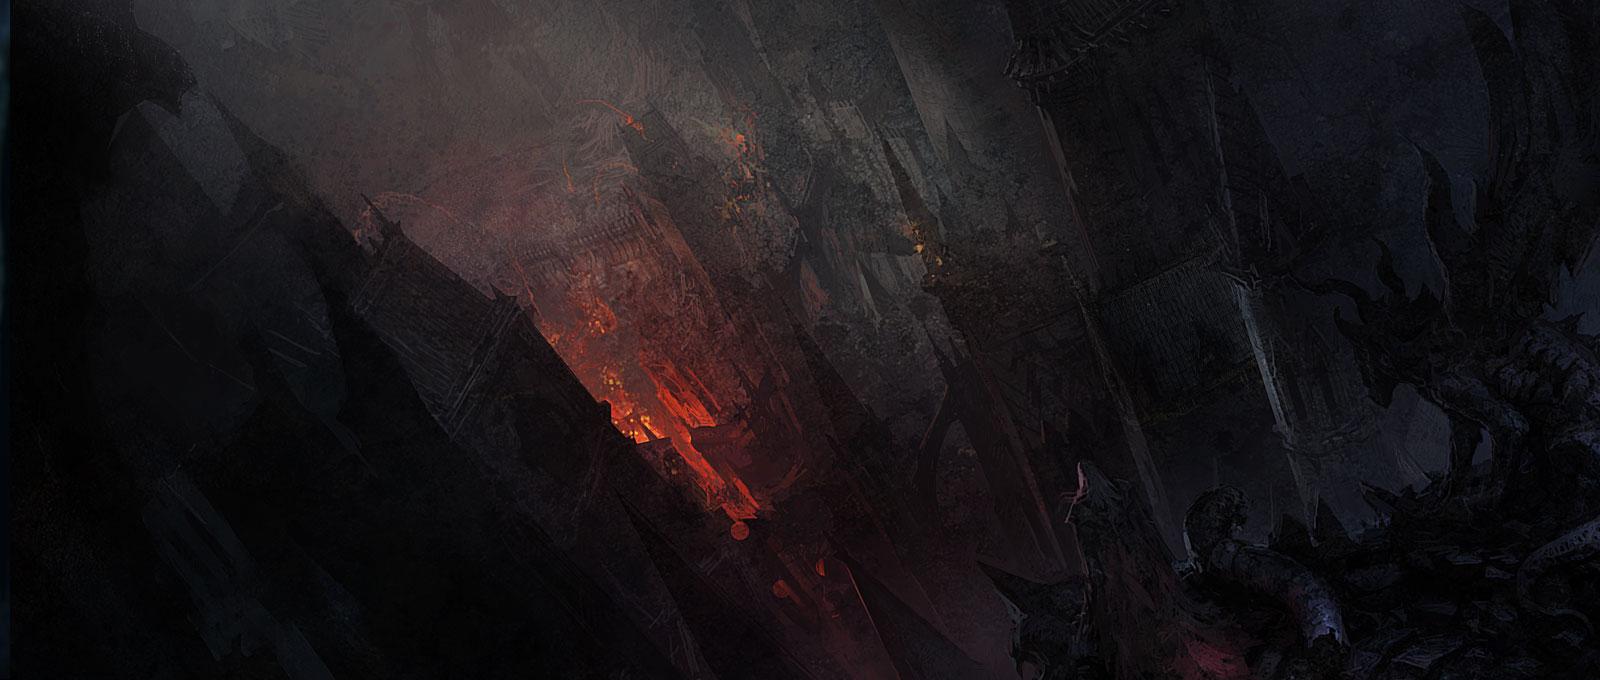 Castlevania-LordsofShadow2 Multi Visuel 005